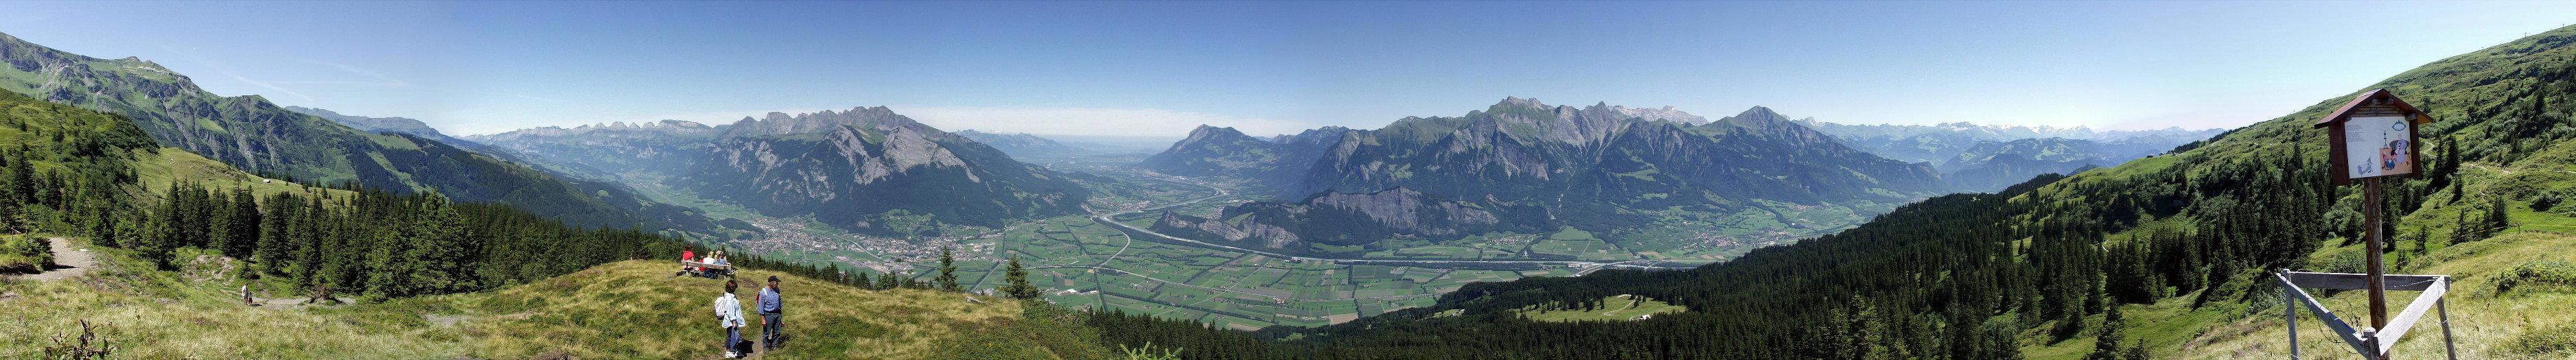 Pizol / Rheintal (Switzerland)